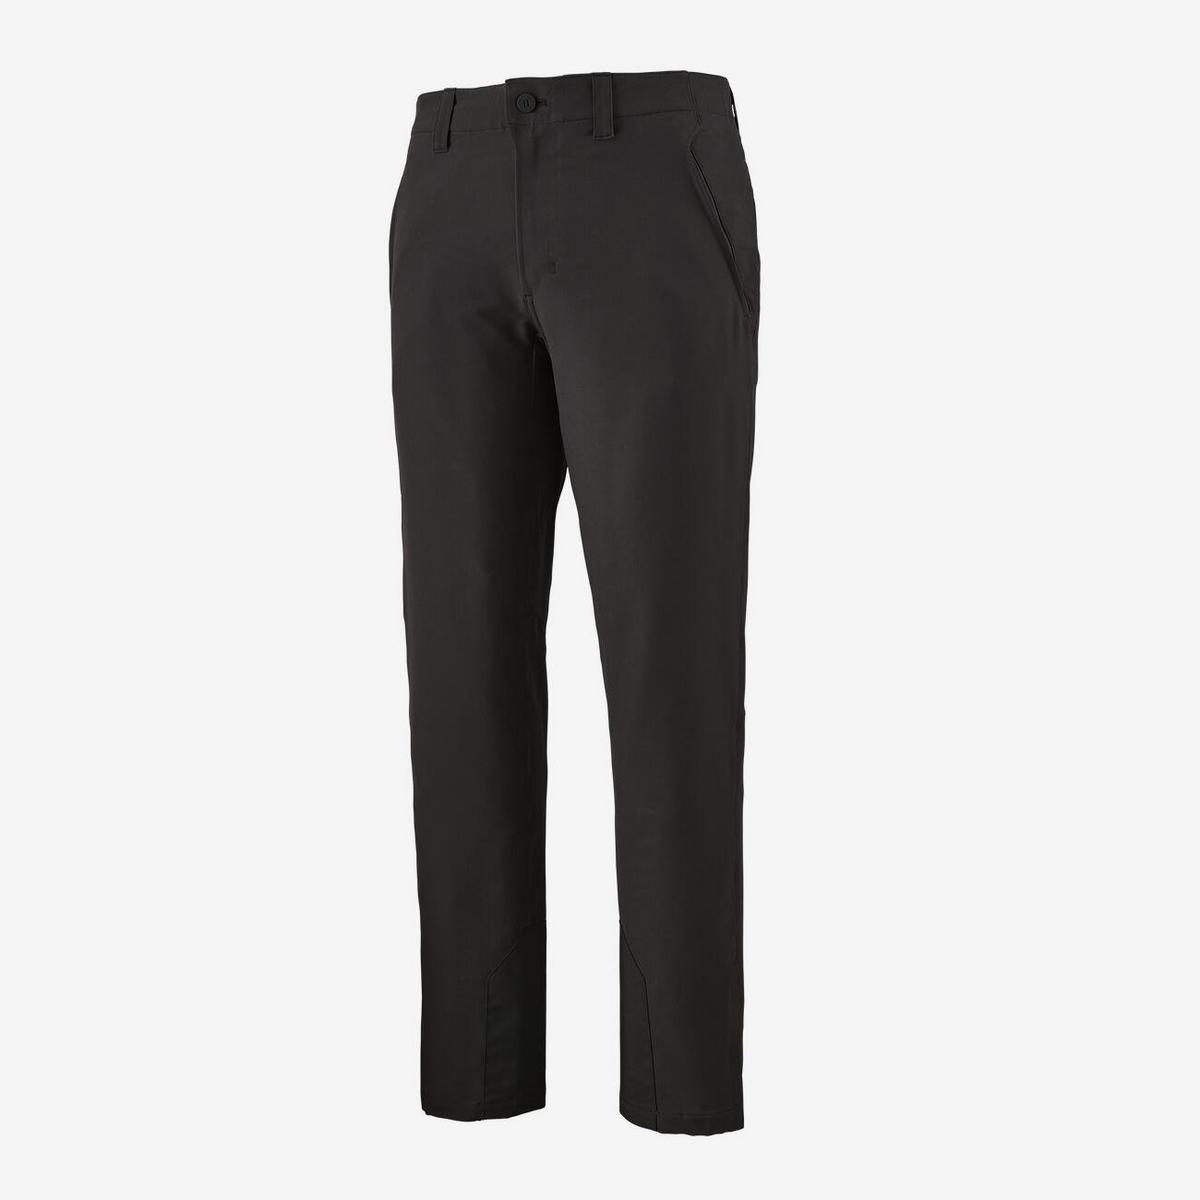 Patagonia Men's Patagonia Crestview Pants Reg - Black